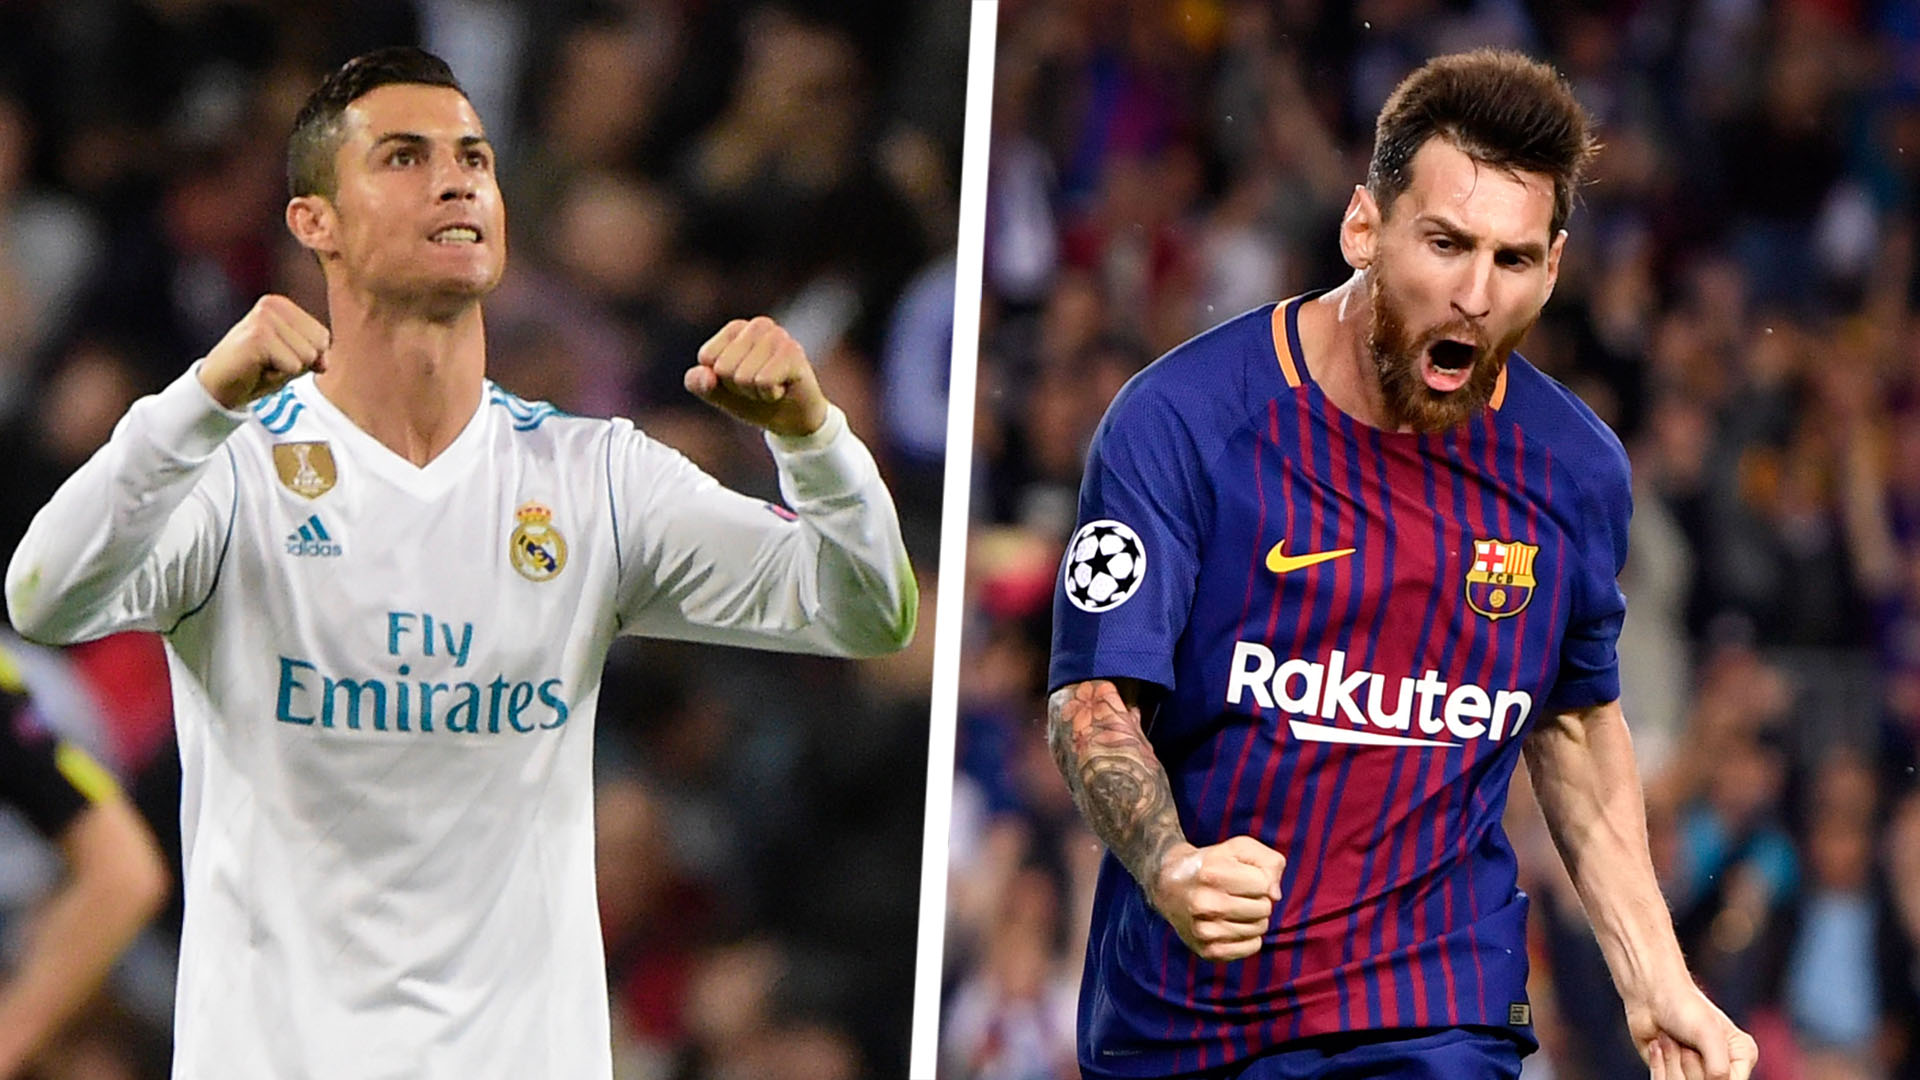 Champions League all-time top scorers - Ronaldo, Messi & UCL goal kings